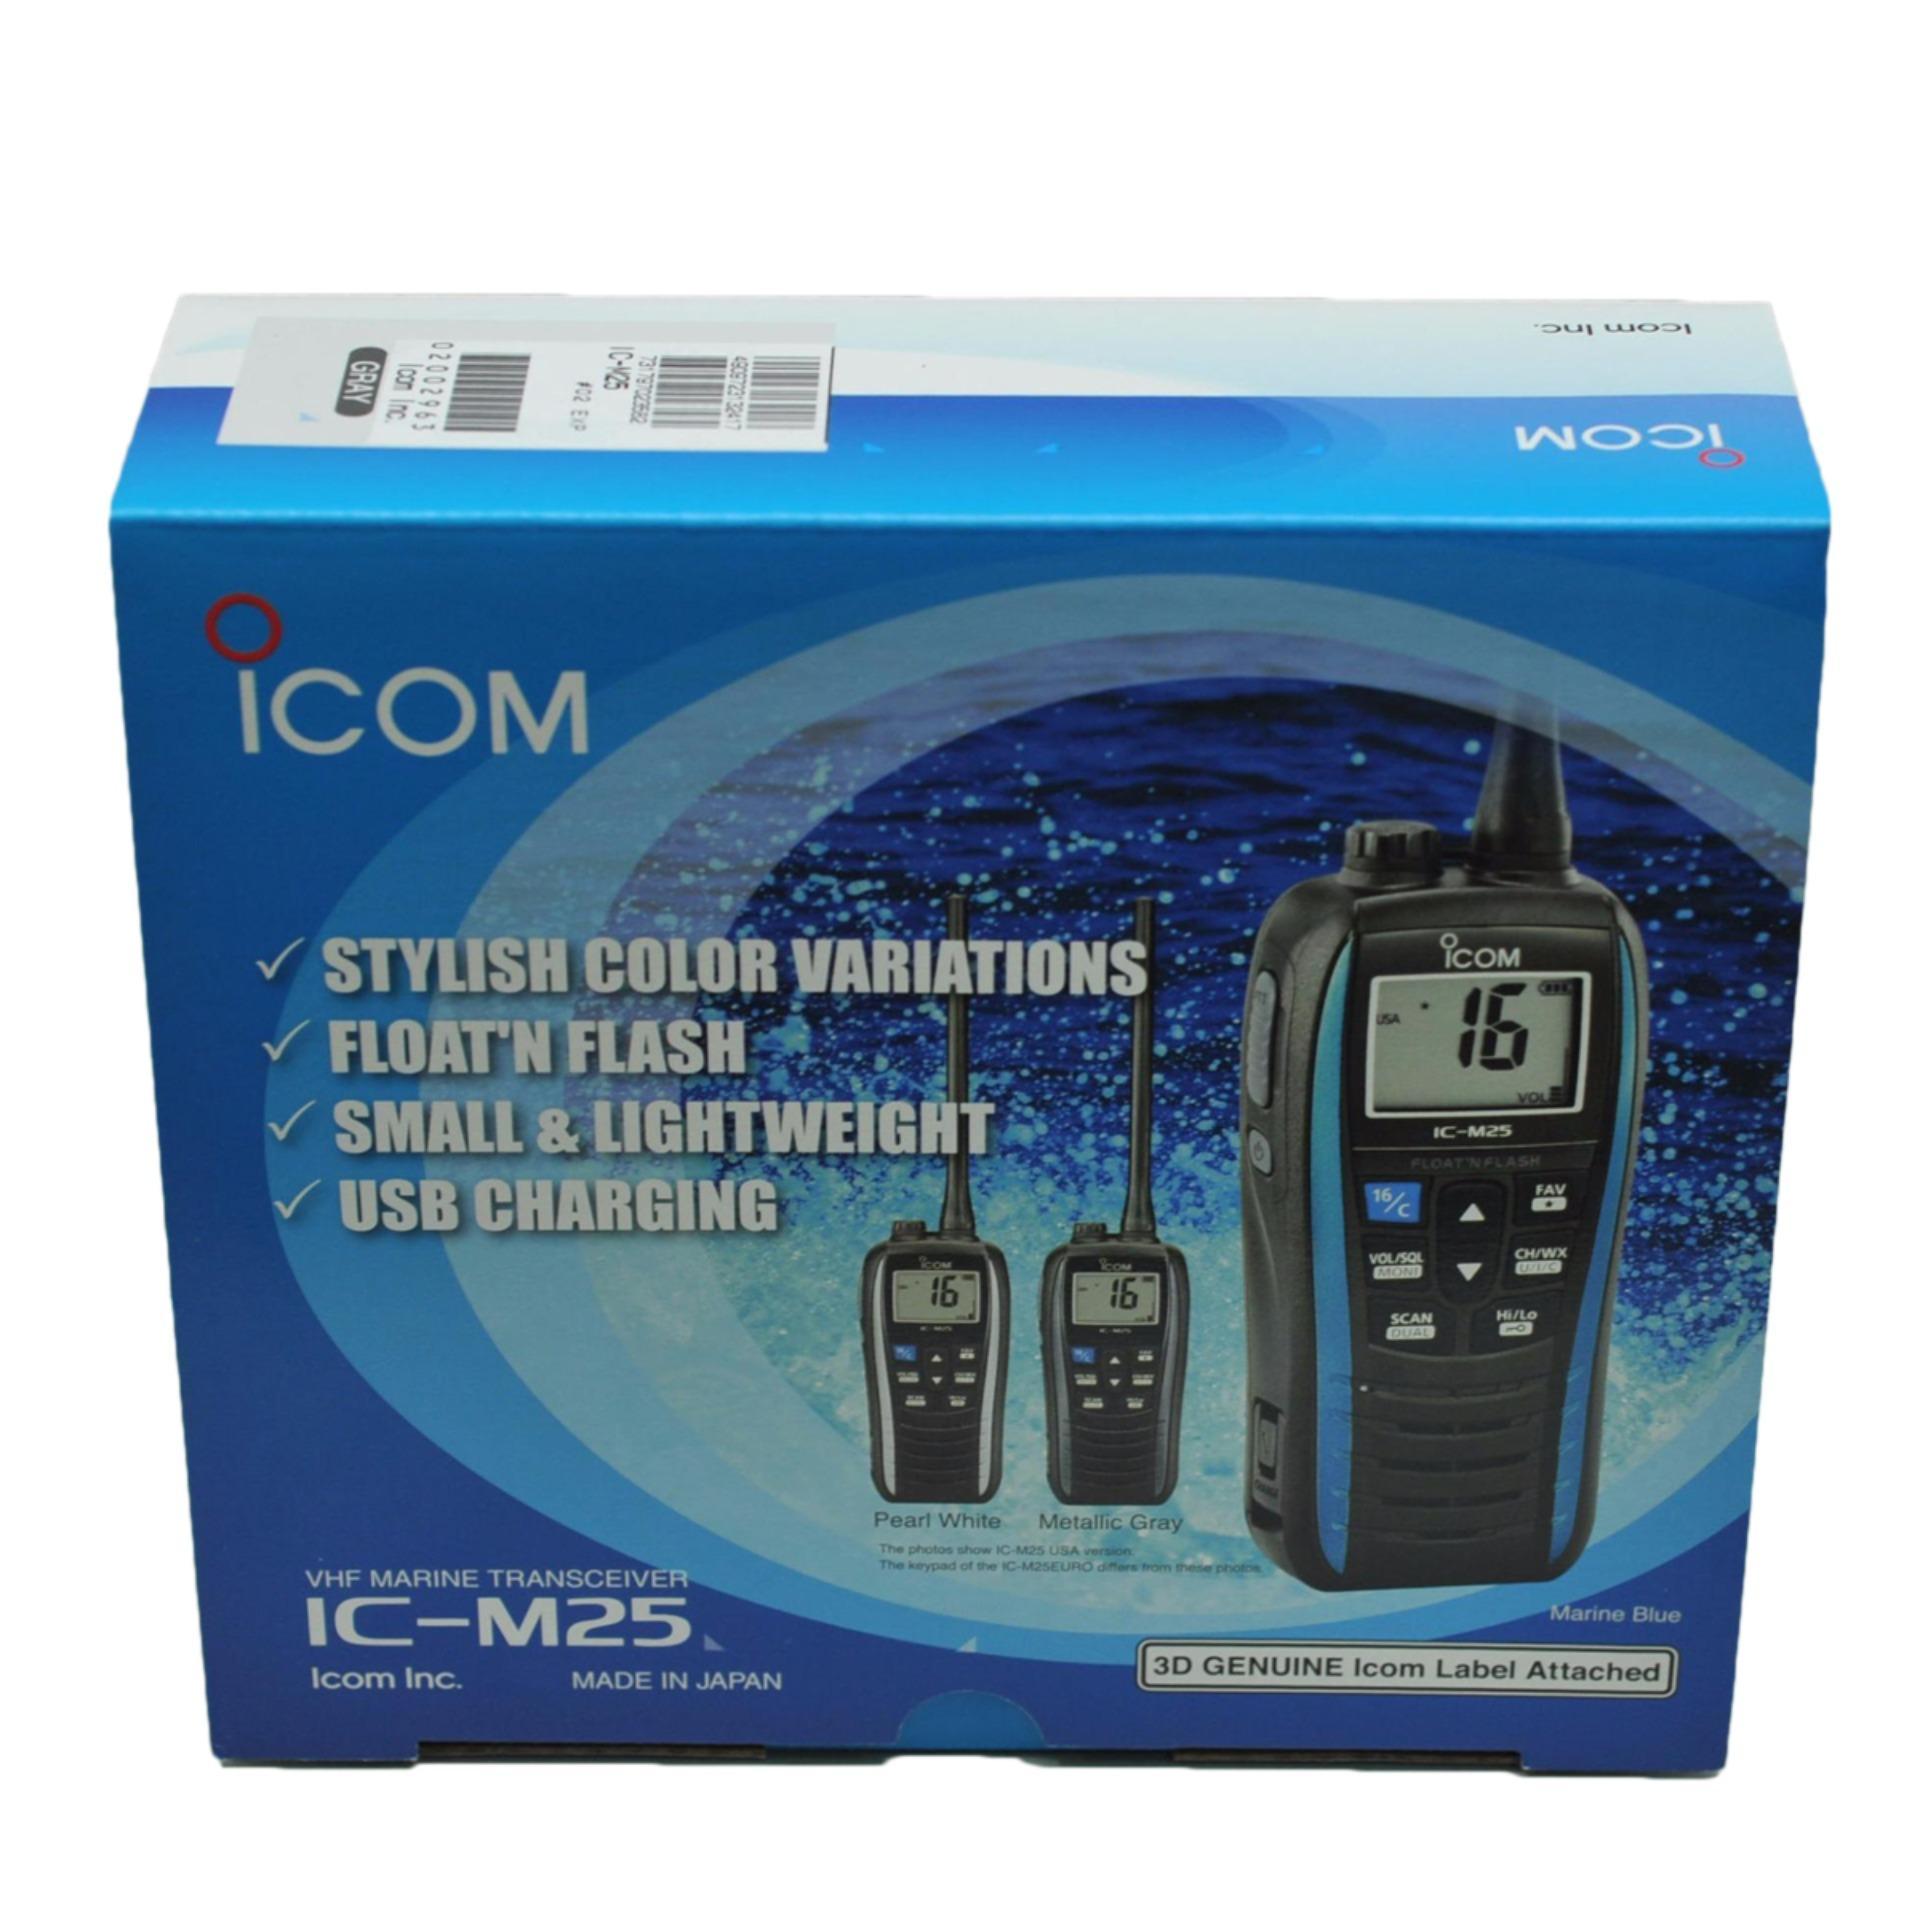 Icom Philippines: Icom price list - Icom Transceiver for sale | Lazada